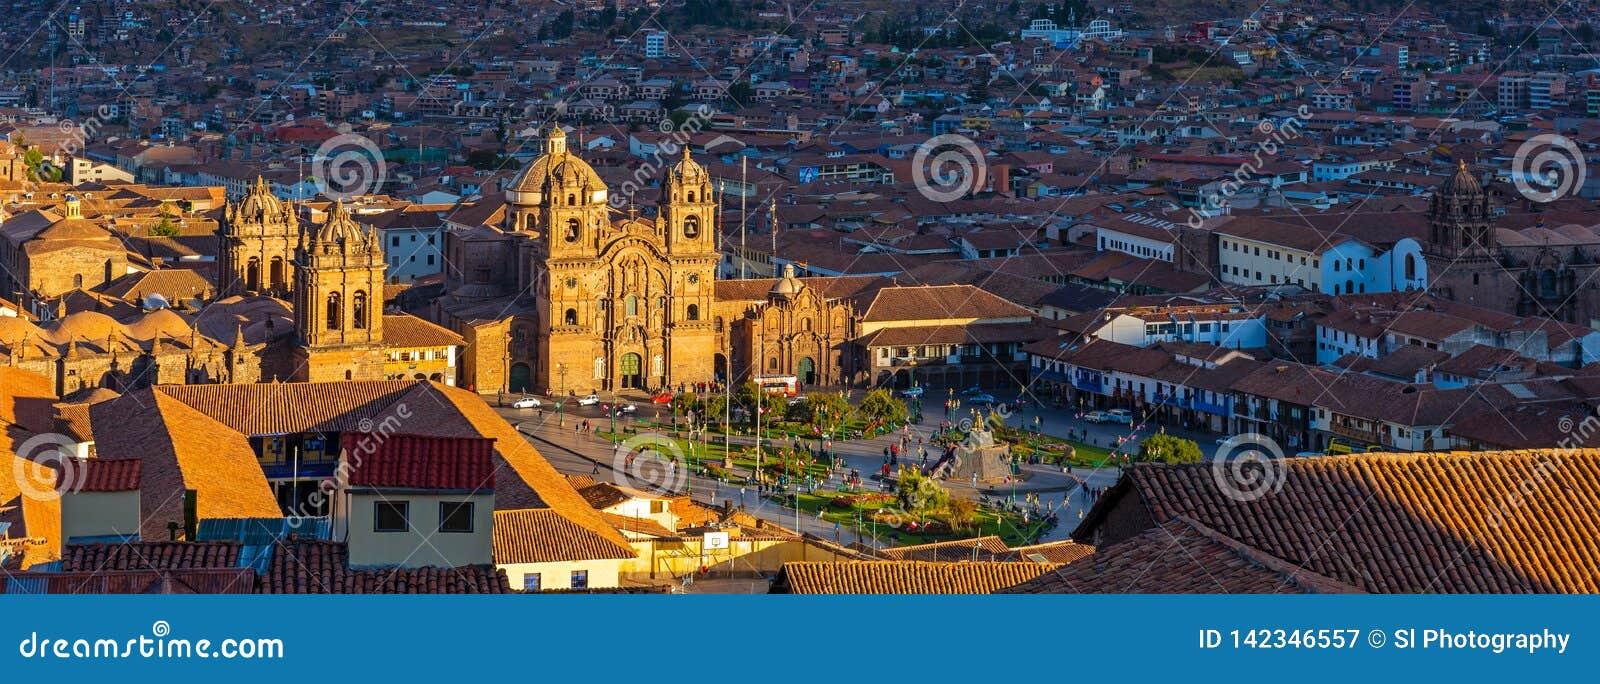 Cityscape of Cusco at Sunset, Peru